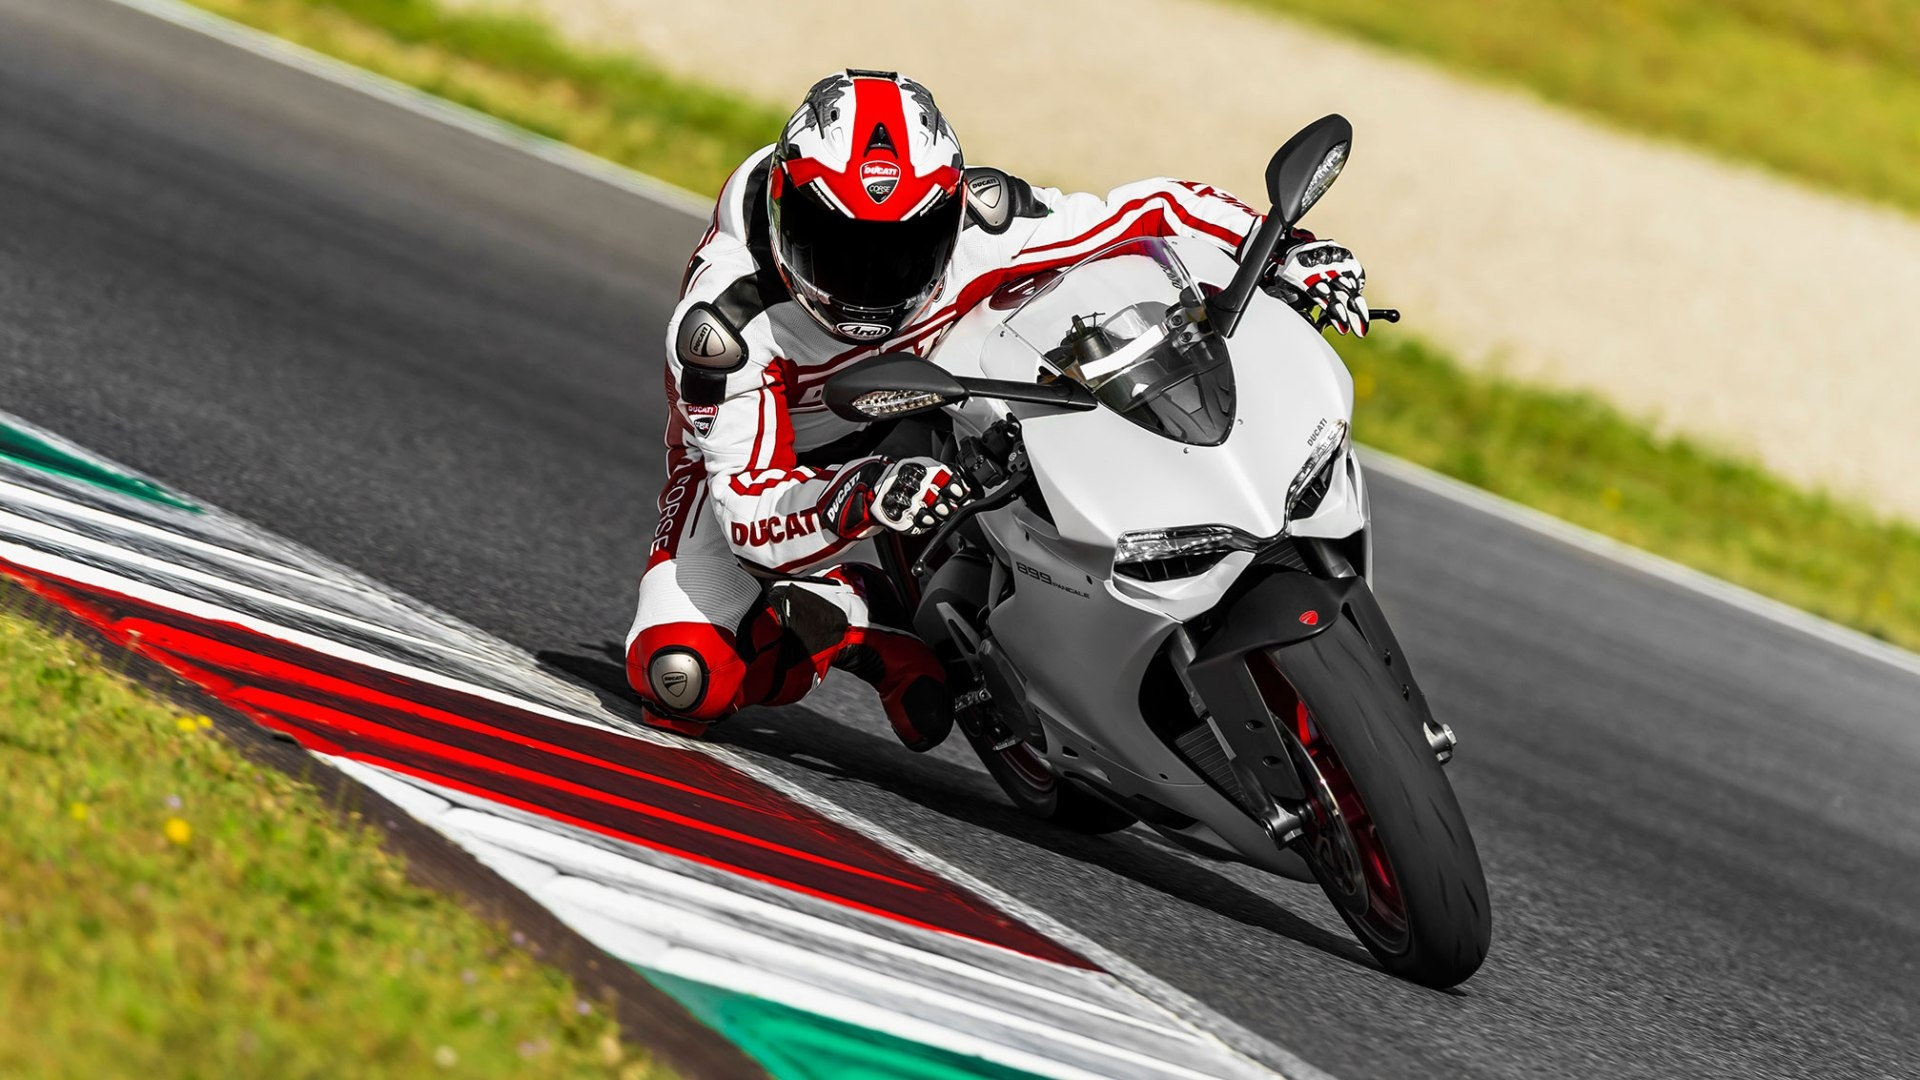 899 panigale 2016 1920x1080 2016 Ducati Panigale Desktop Wallpapers 1920x1080